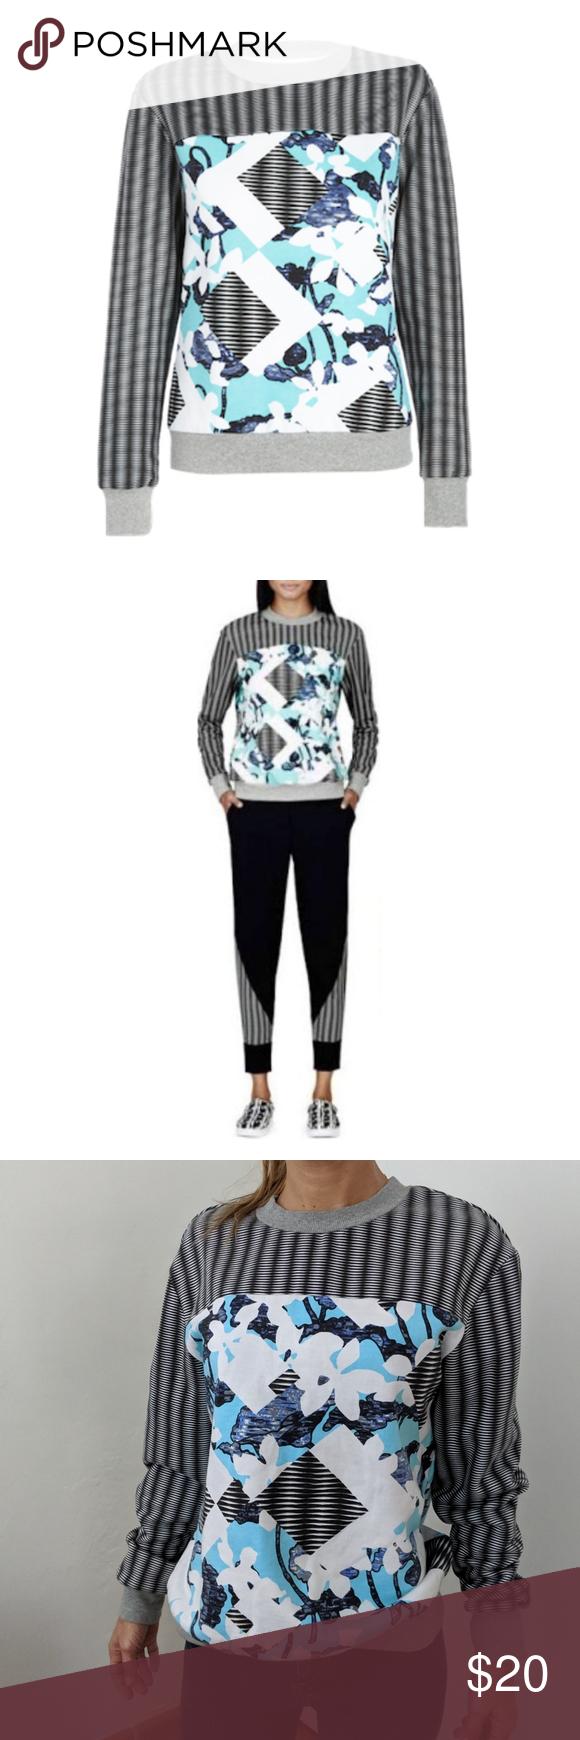 Peter Pilotto Pullover Sweatshirt Black White And Turquoise Dressy Sweatshirt For The Peter Piloto X Targe Clothes Design Dressy Sweatshirt Stretch Midi Dress [ 1740 x 580 Pixel ]